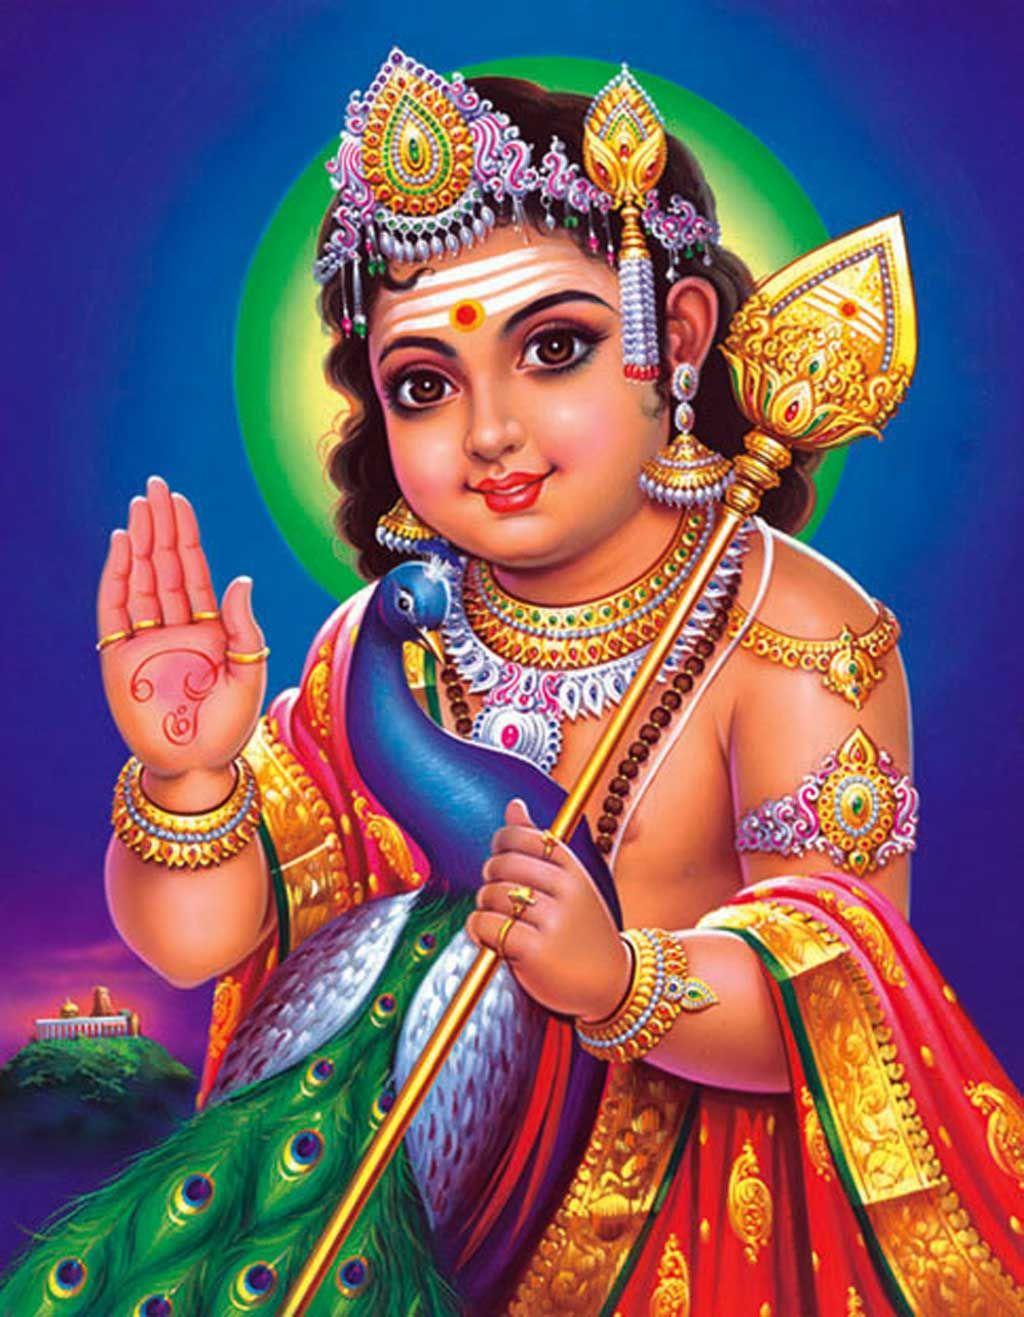 Full Hd God Murugan Hd Image Free Download Wallpapers Android Lord Murugan Wallpapers Lord Murugan Lord Shiva Family